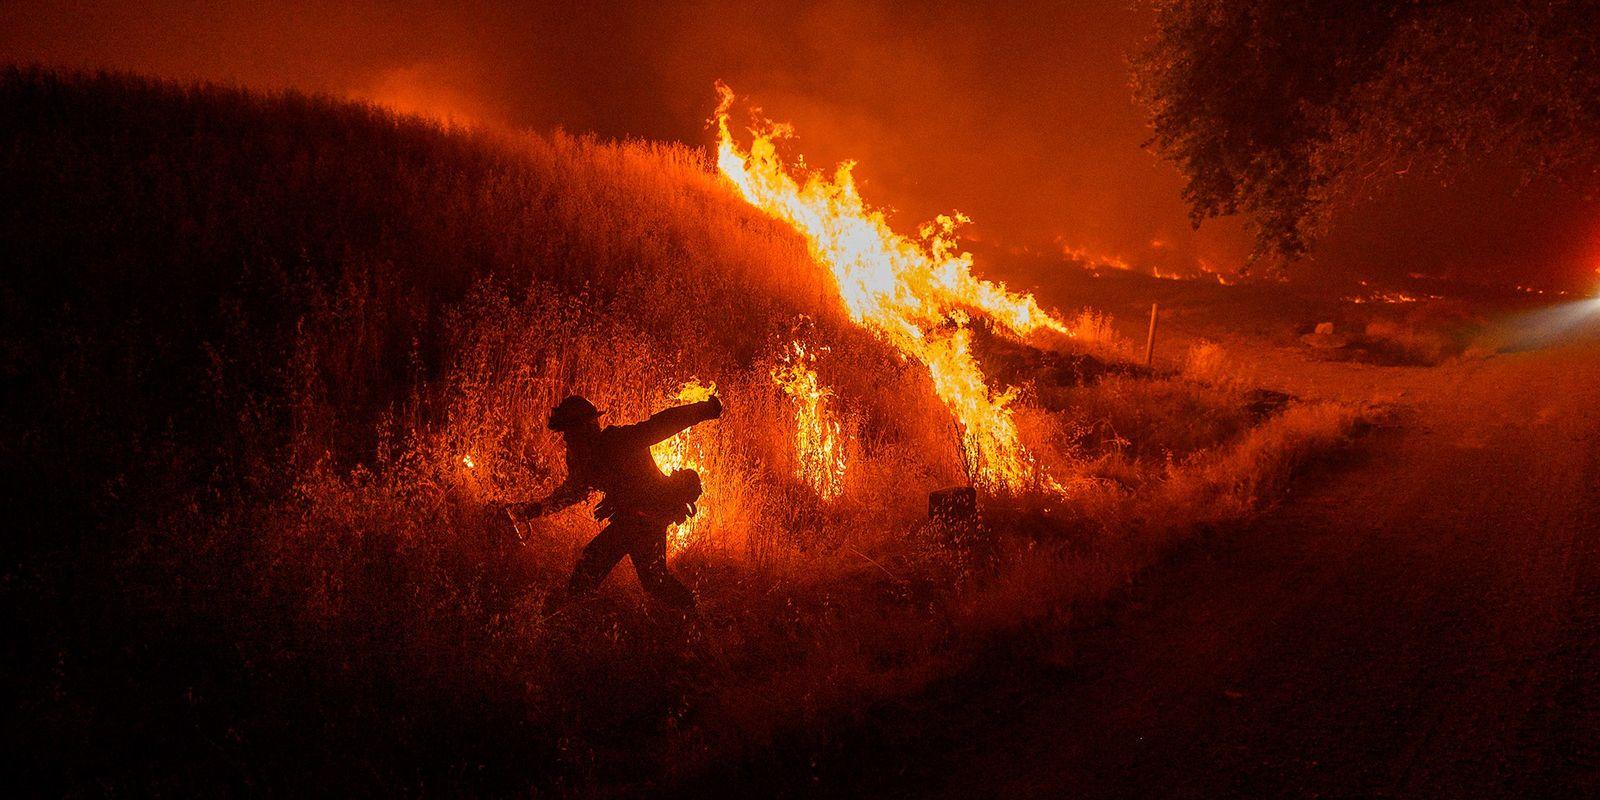 COVID-19 Piora Época de Incêndios Já de Si Complicada